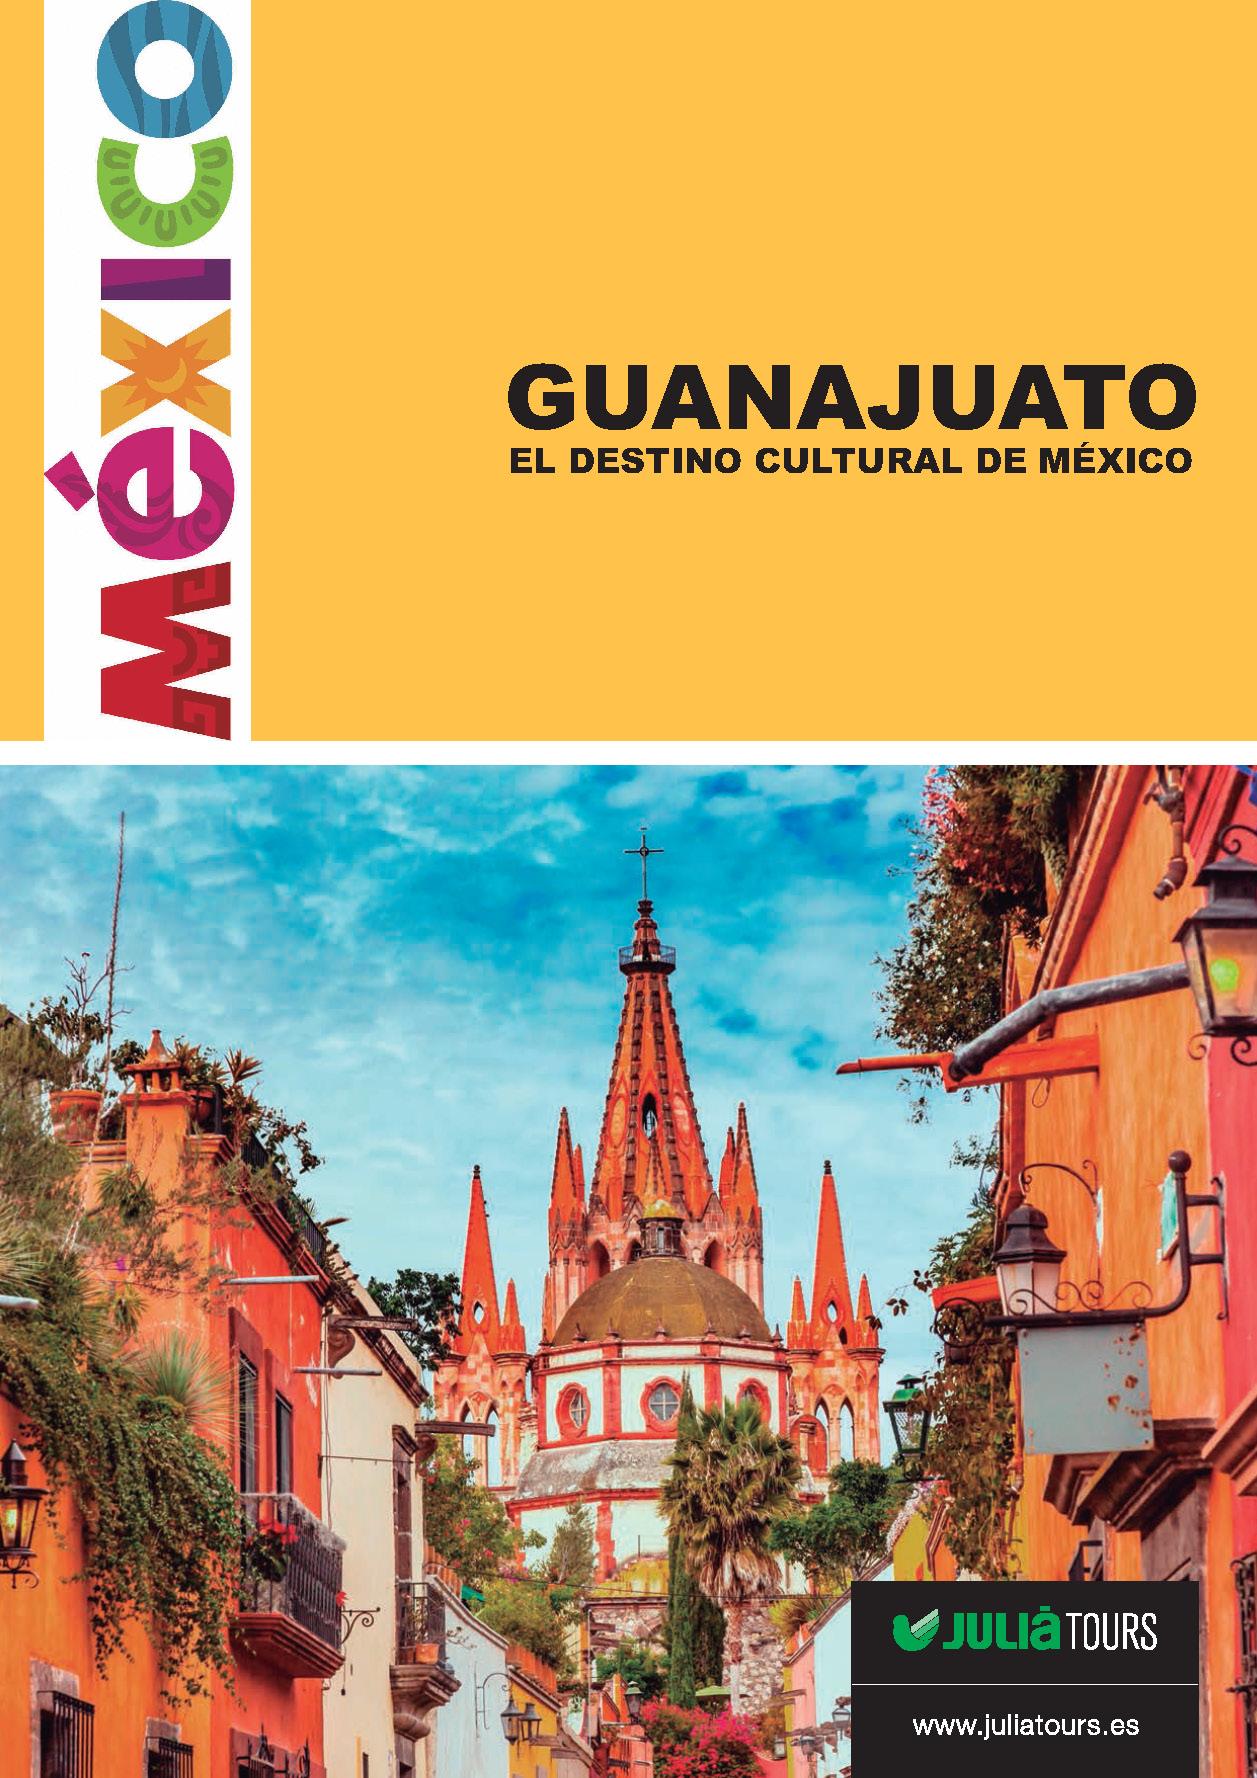 Catalogo Julia Tours Especial Guanajuato 2018